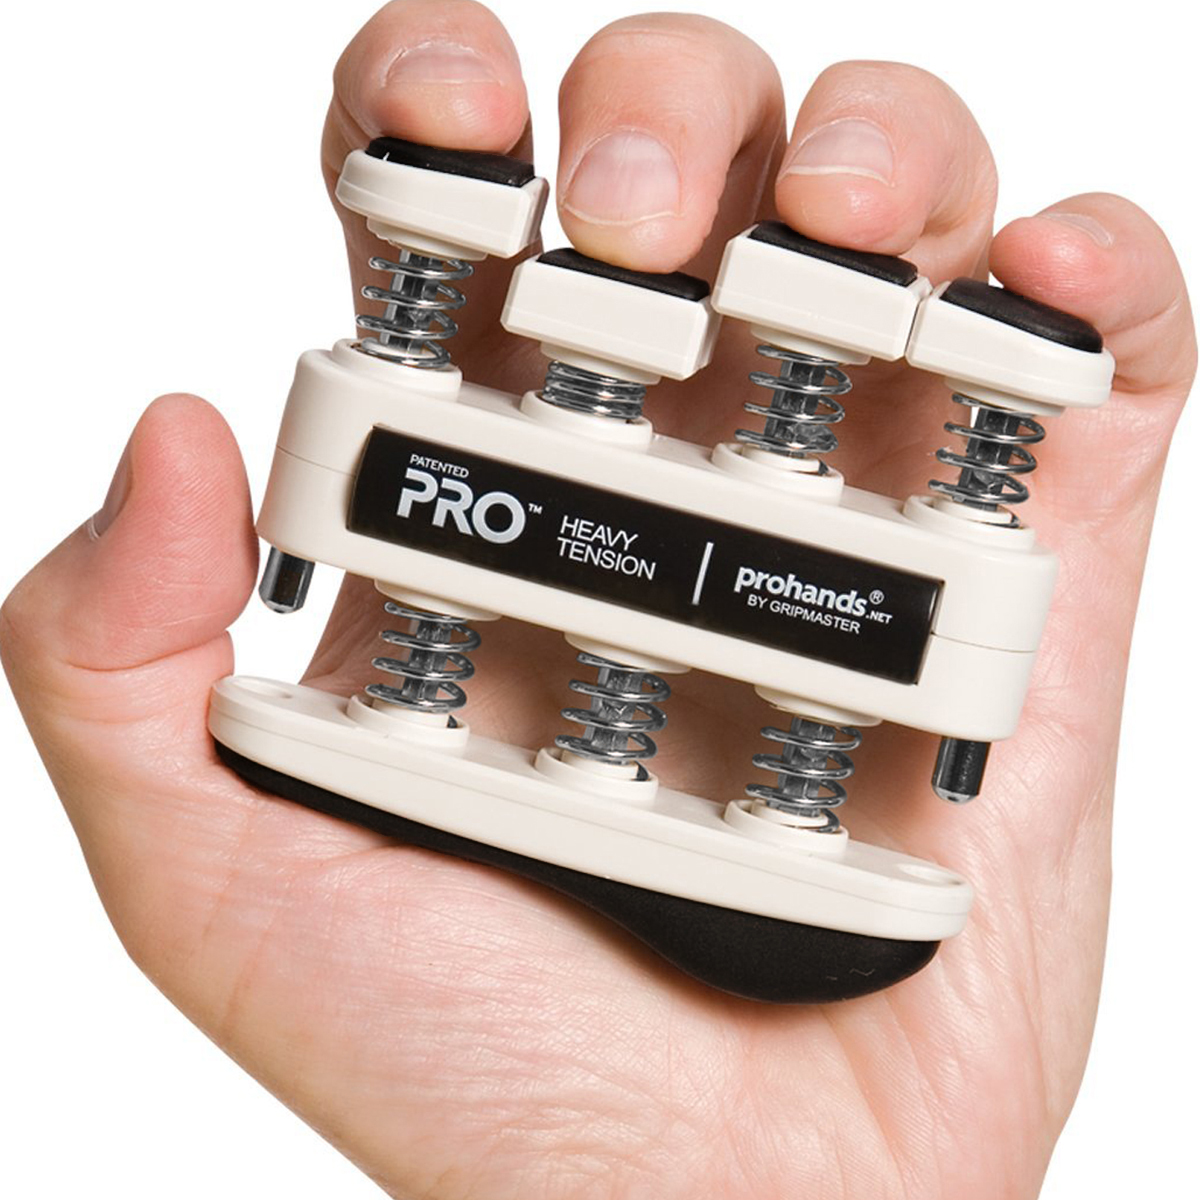 Gripmaster-Pro-Hand-and-Finger-Exerciser-Choose-from-5-grip-strengthener-levels thumbnail 3